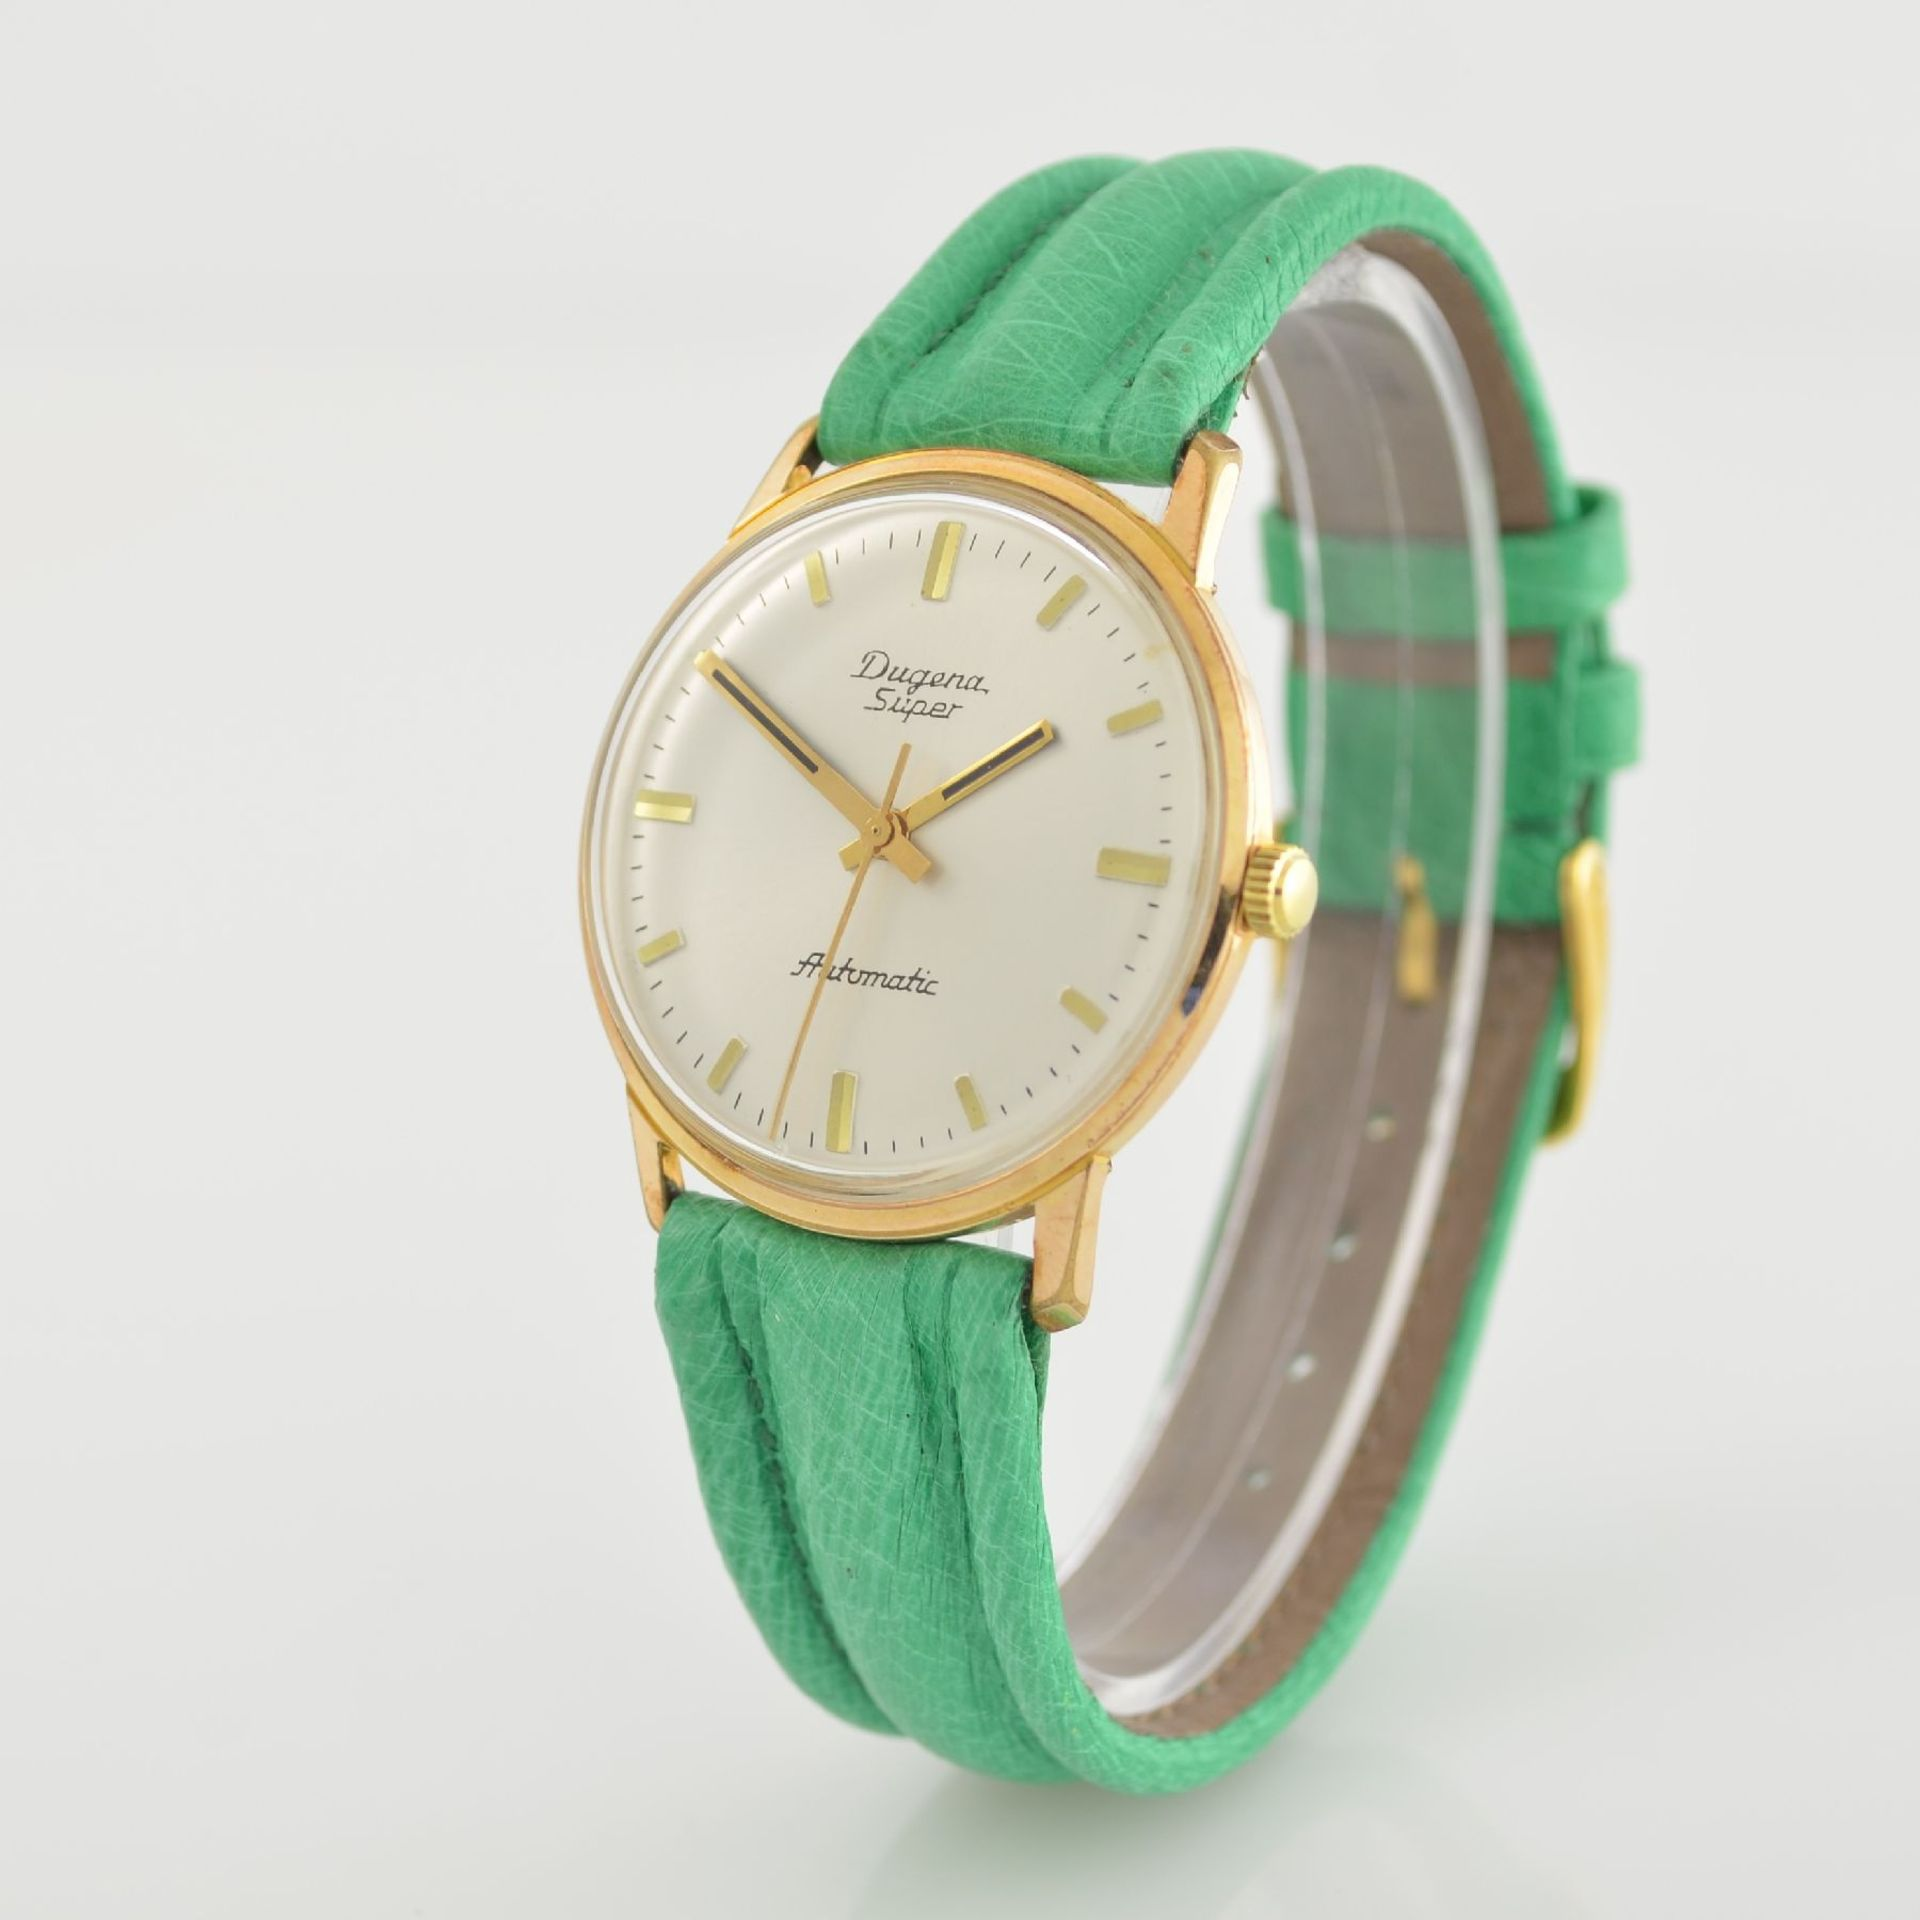 Konvolut: 2 Armbanduhren, beide Schweiz um 1970, beide Metall verg., 1 x Arsa Armbandwecker, Boden - Bild 9 aus 12